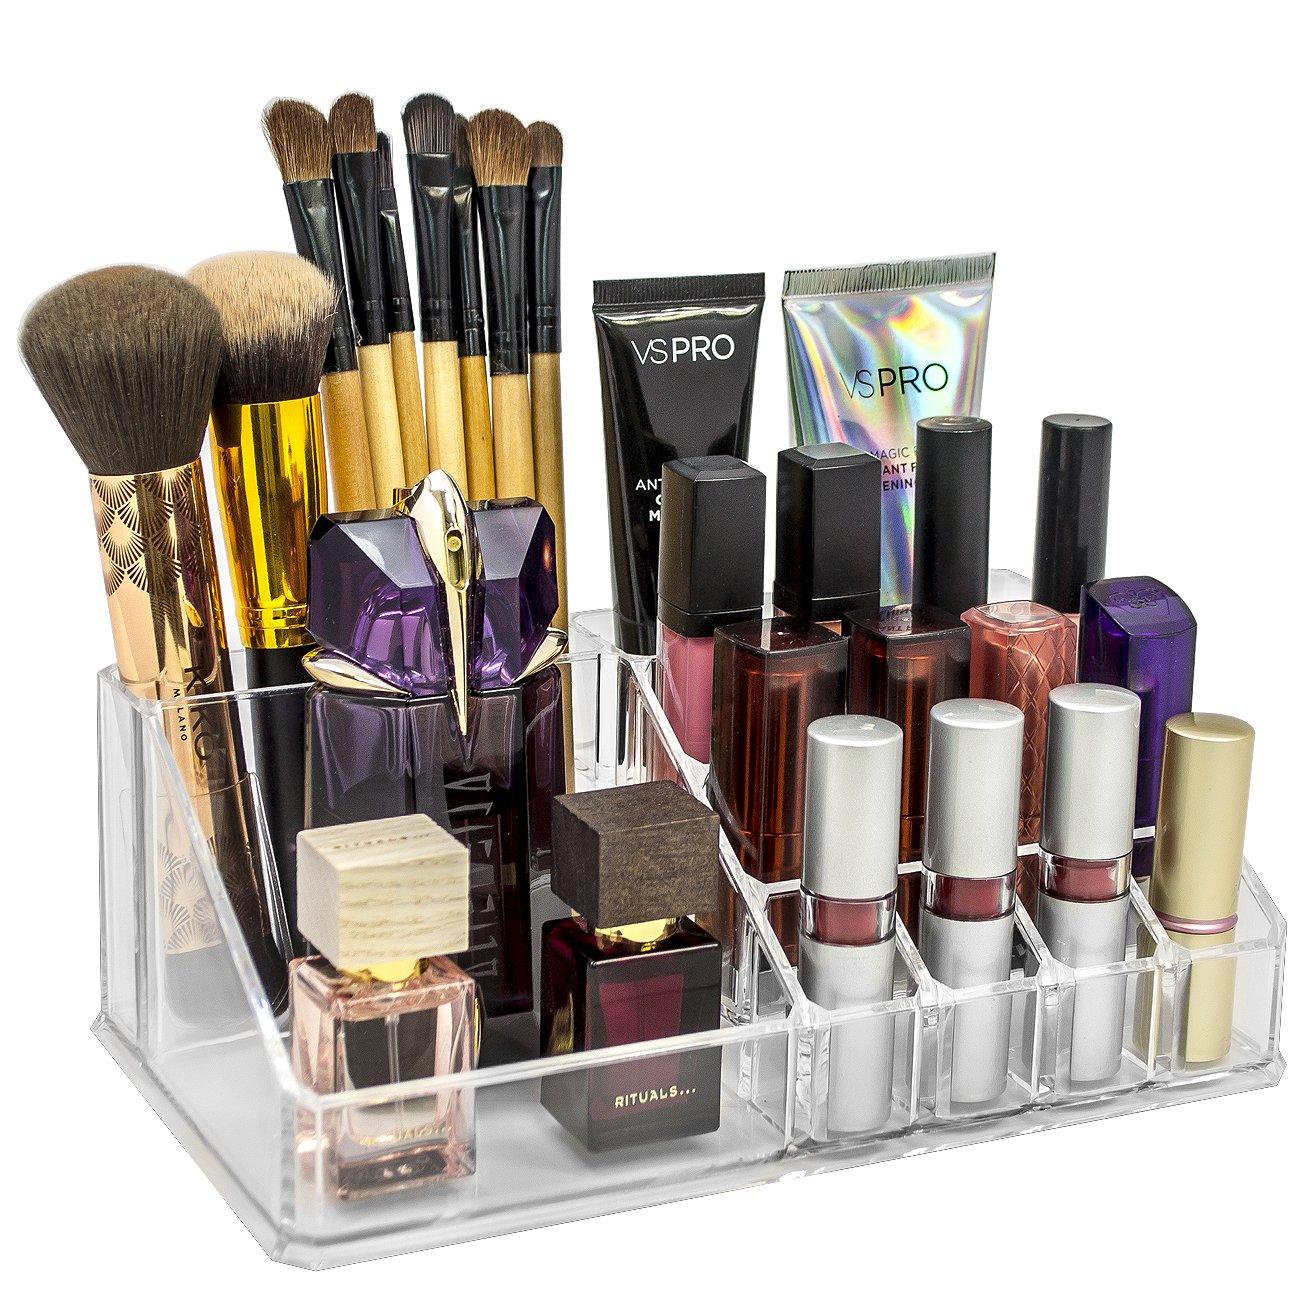 Sorbus® Acrylic Cosmetics Makeup and Jewelry Storage Case Display Top–Glamorous, Space- Saving, Stylish Acrylic Bathroom Organizer (Top Style 1)